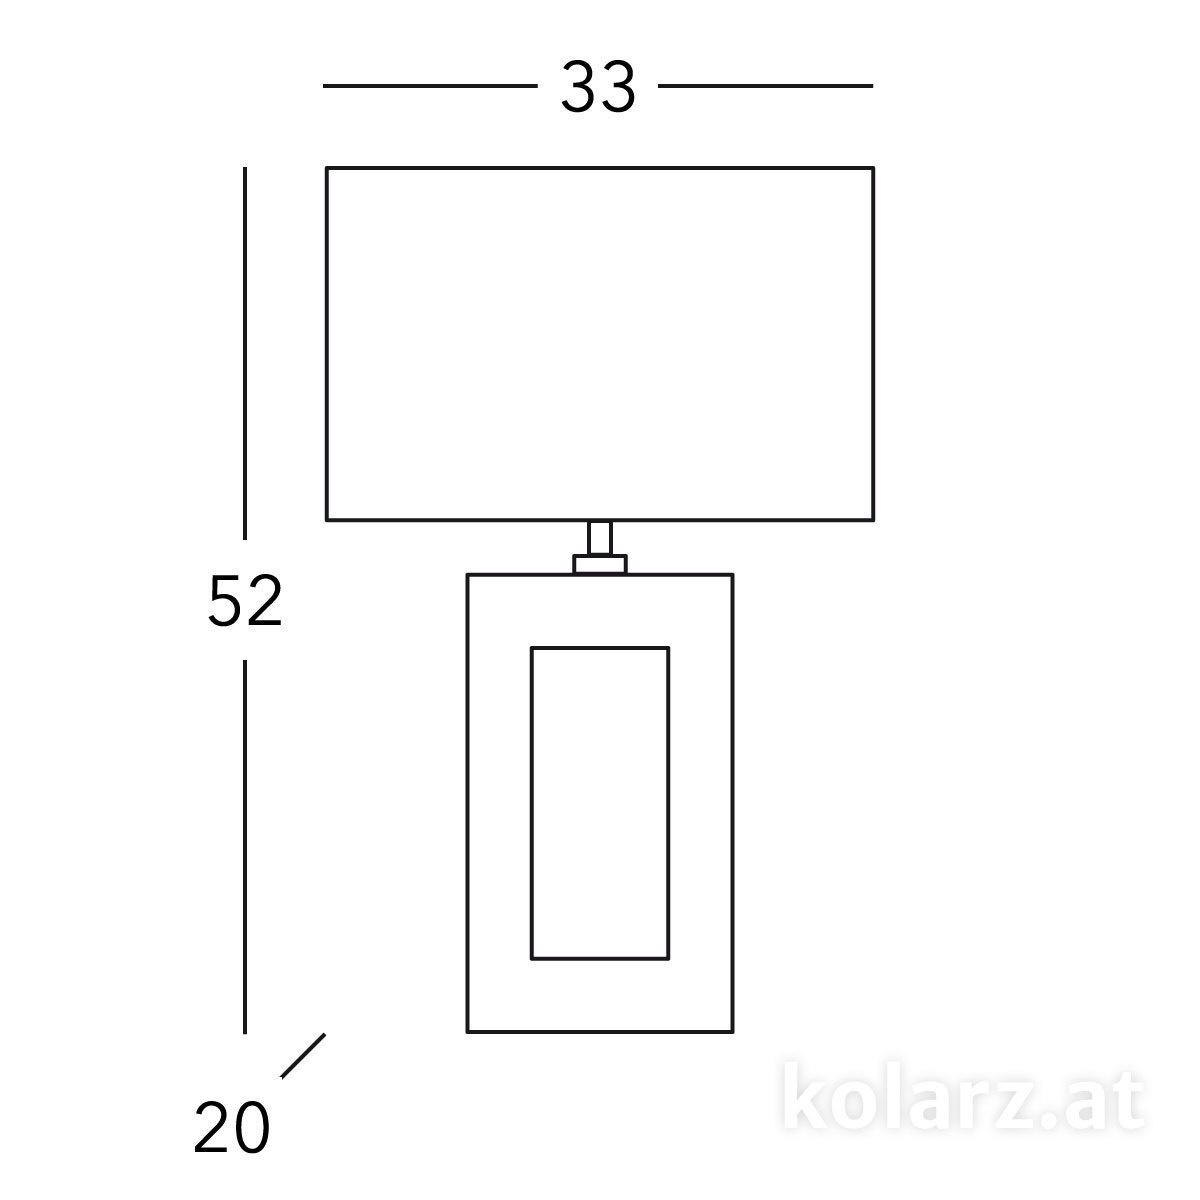 5360-70180__al30-s1.jpg